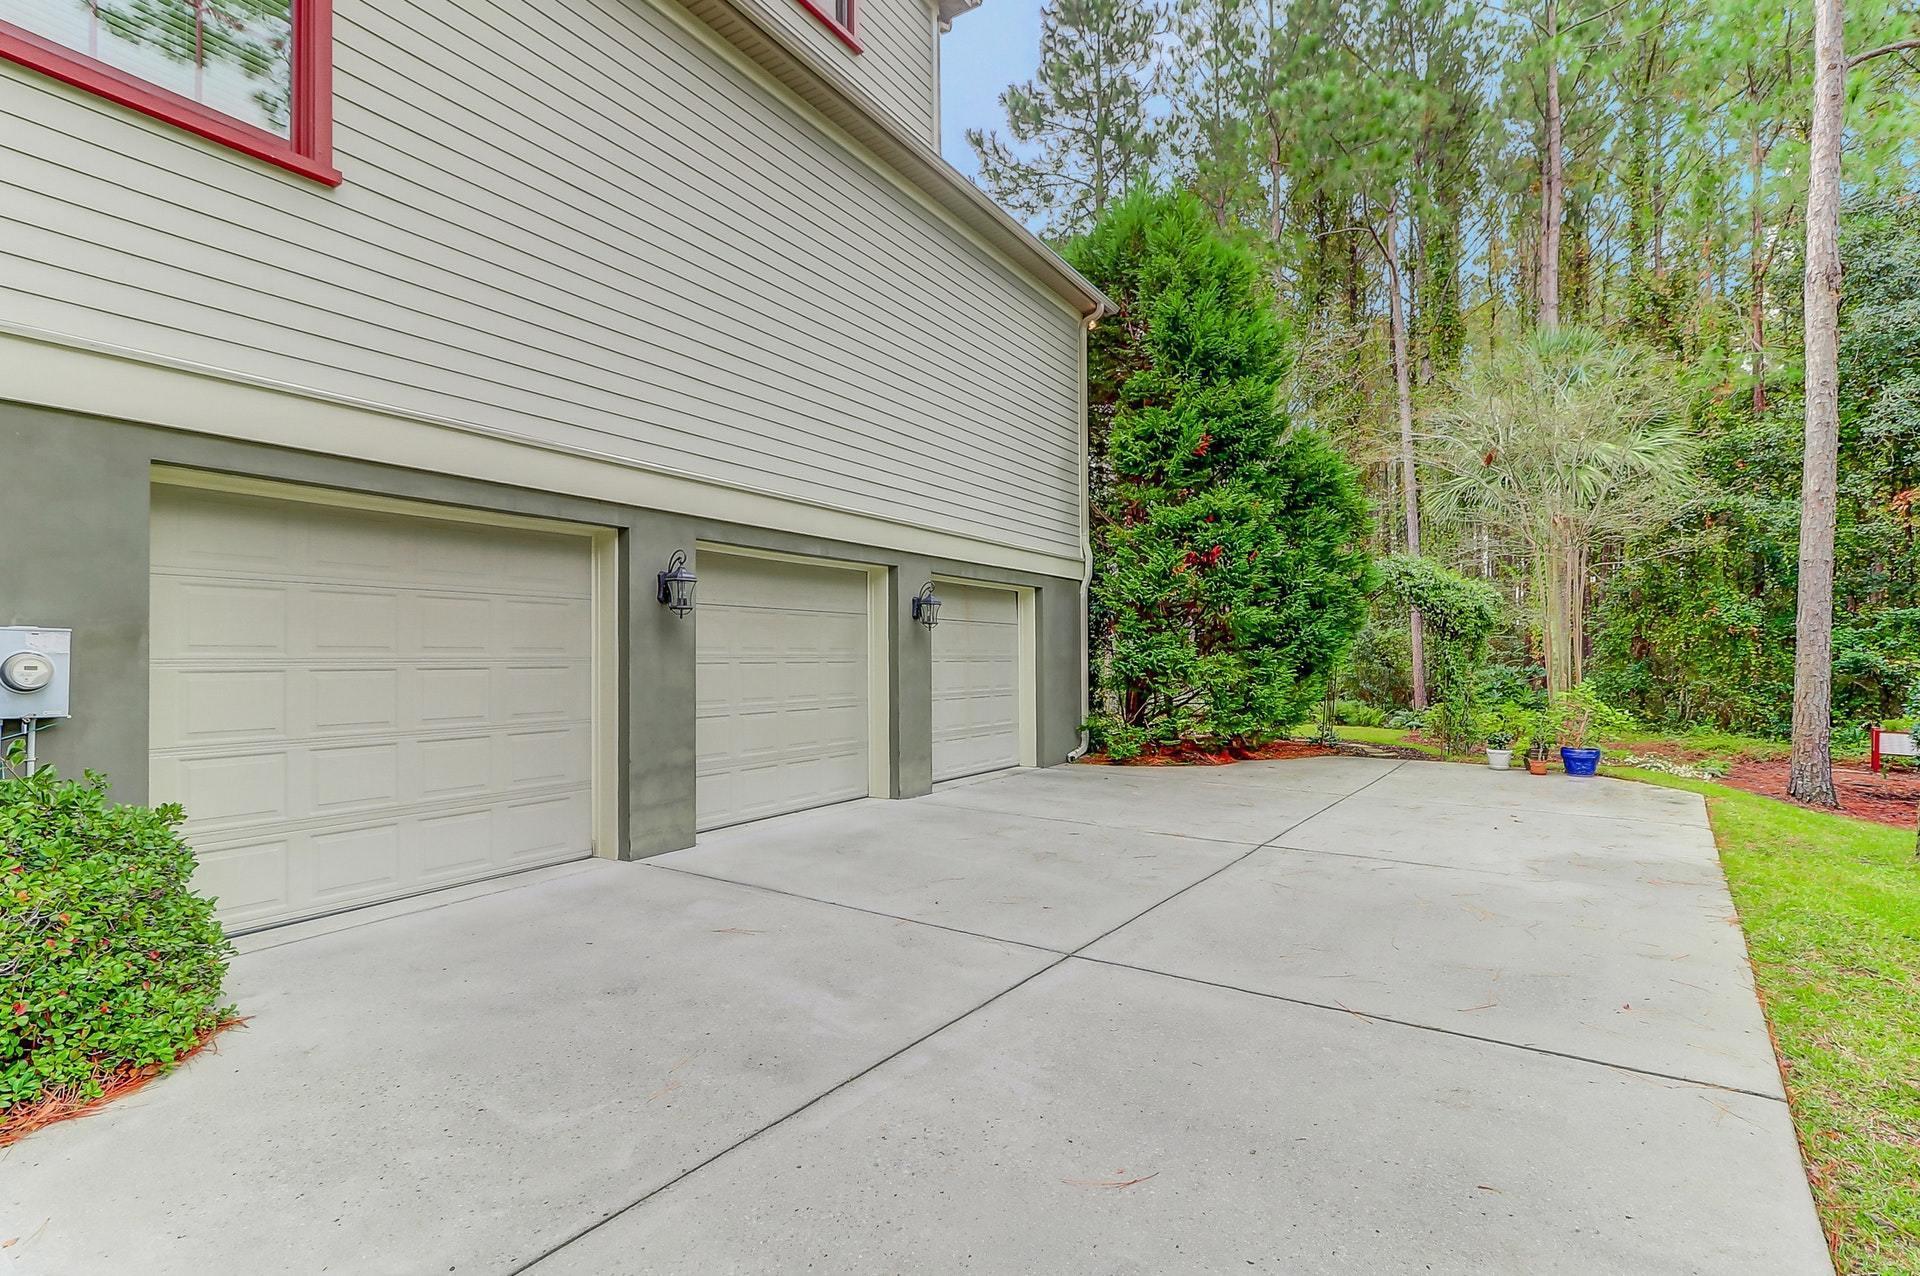 Back Bay Village Homes For Sale - 301 Indigo Bay, Mount Pleasant, SC - 31